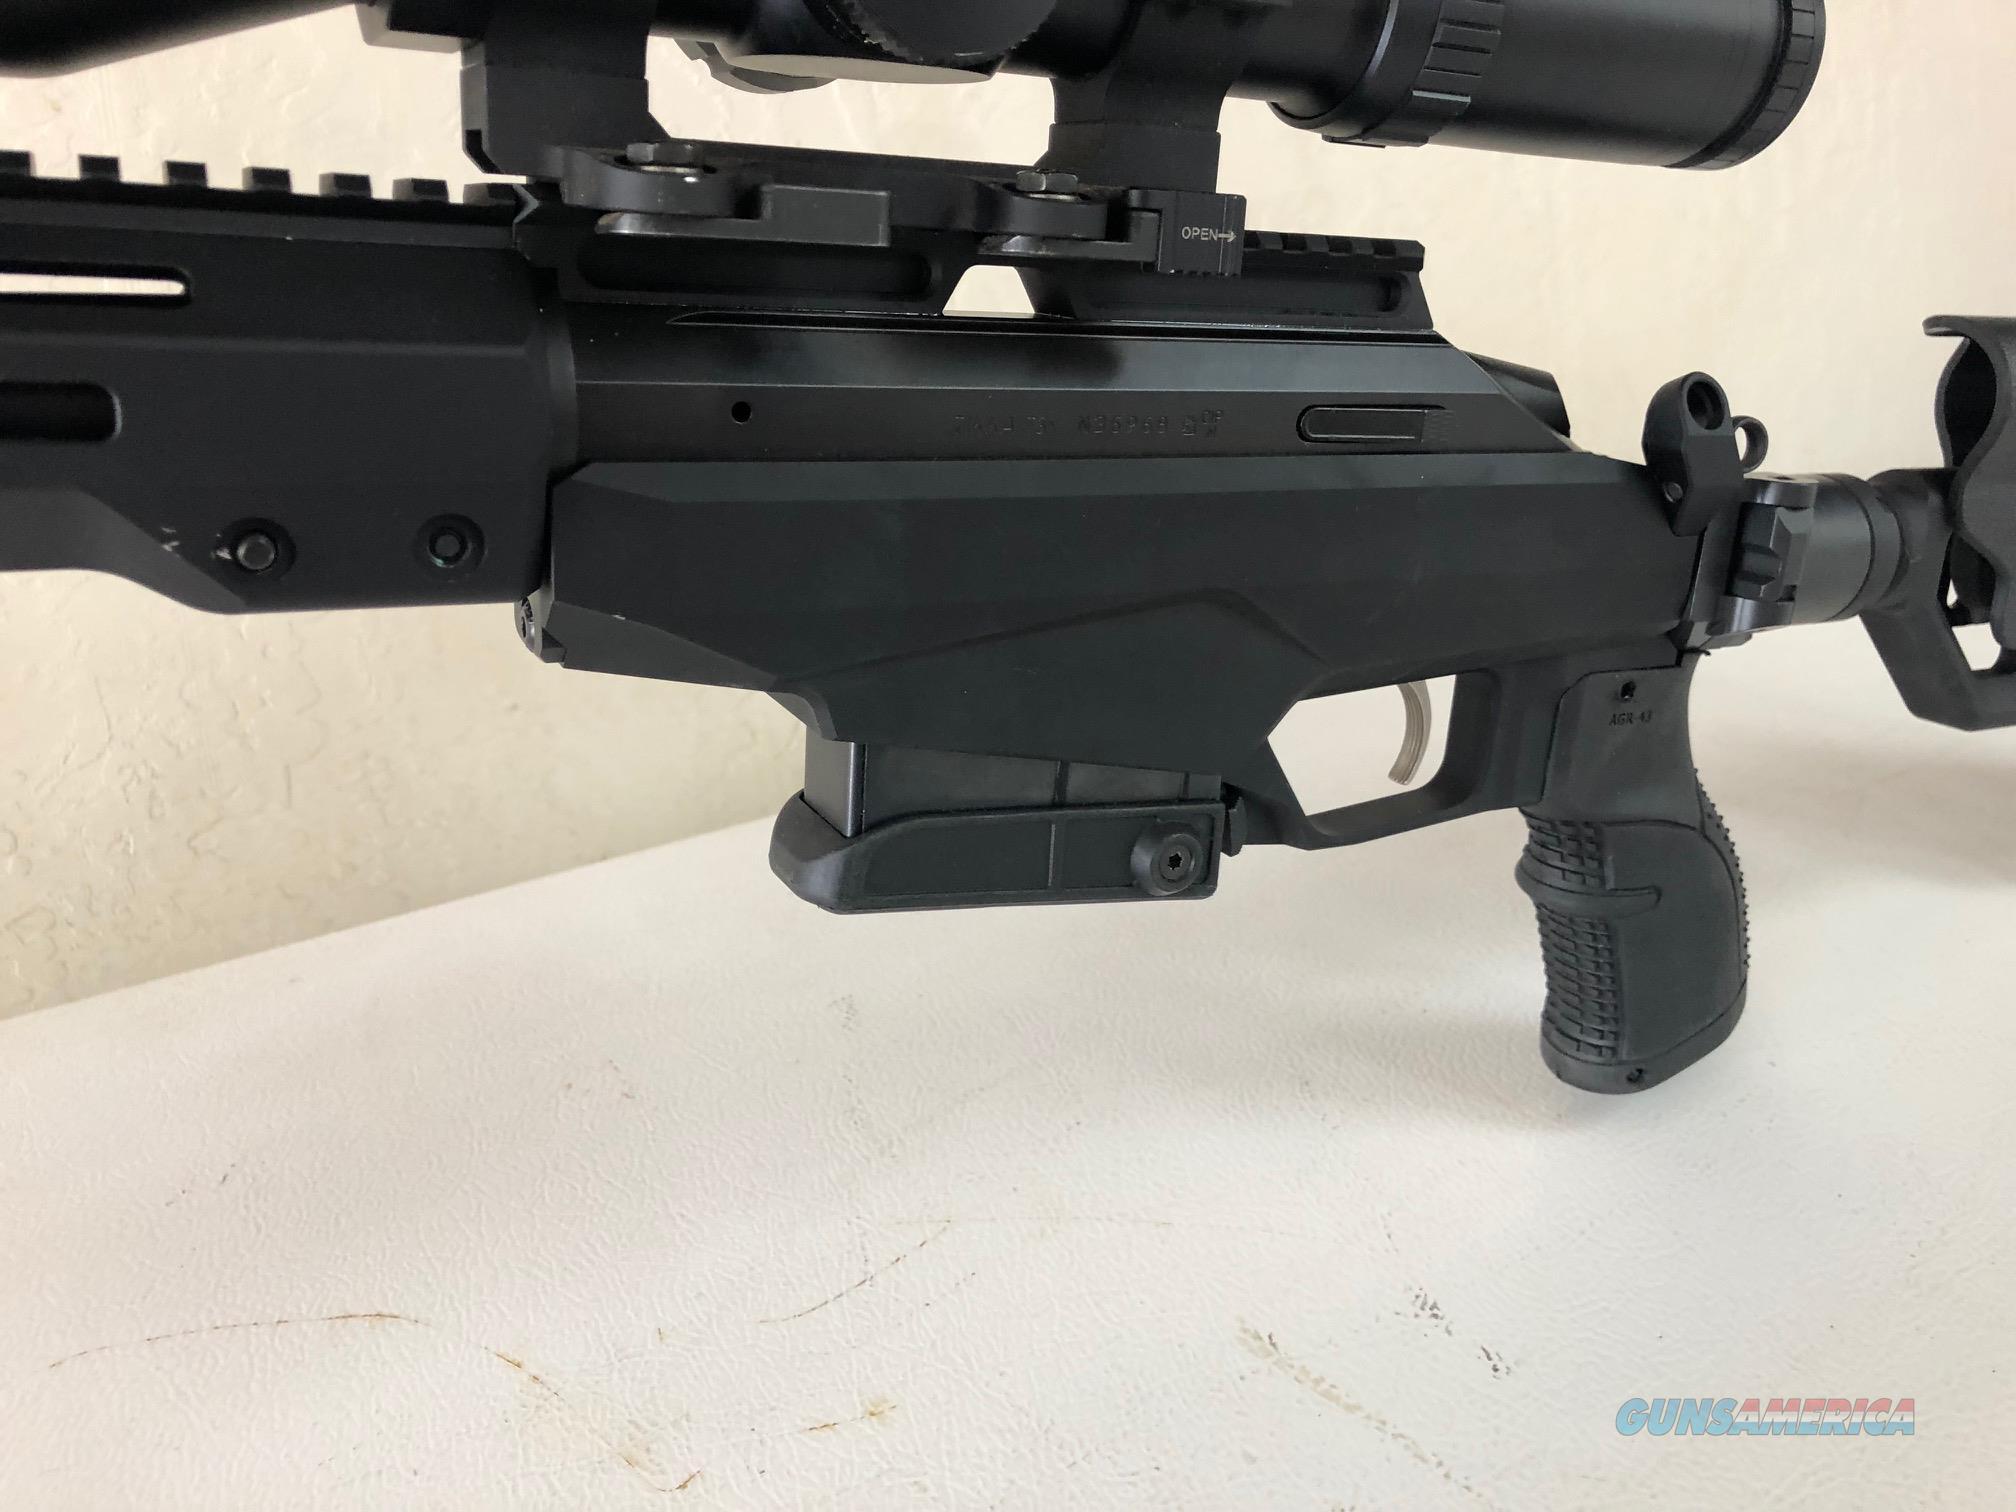 Tikka T3x TAC A1  Guns > Rifles > Tikka Rifles > T3